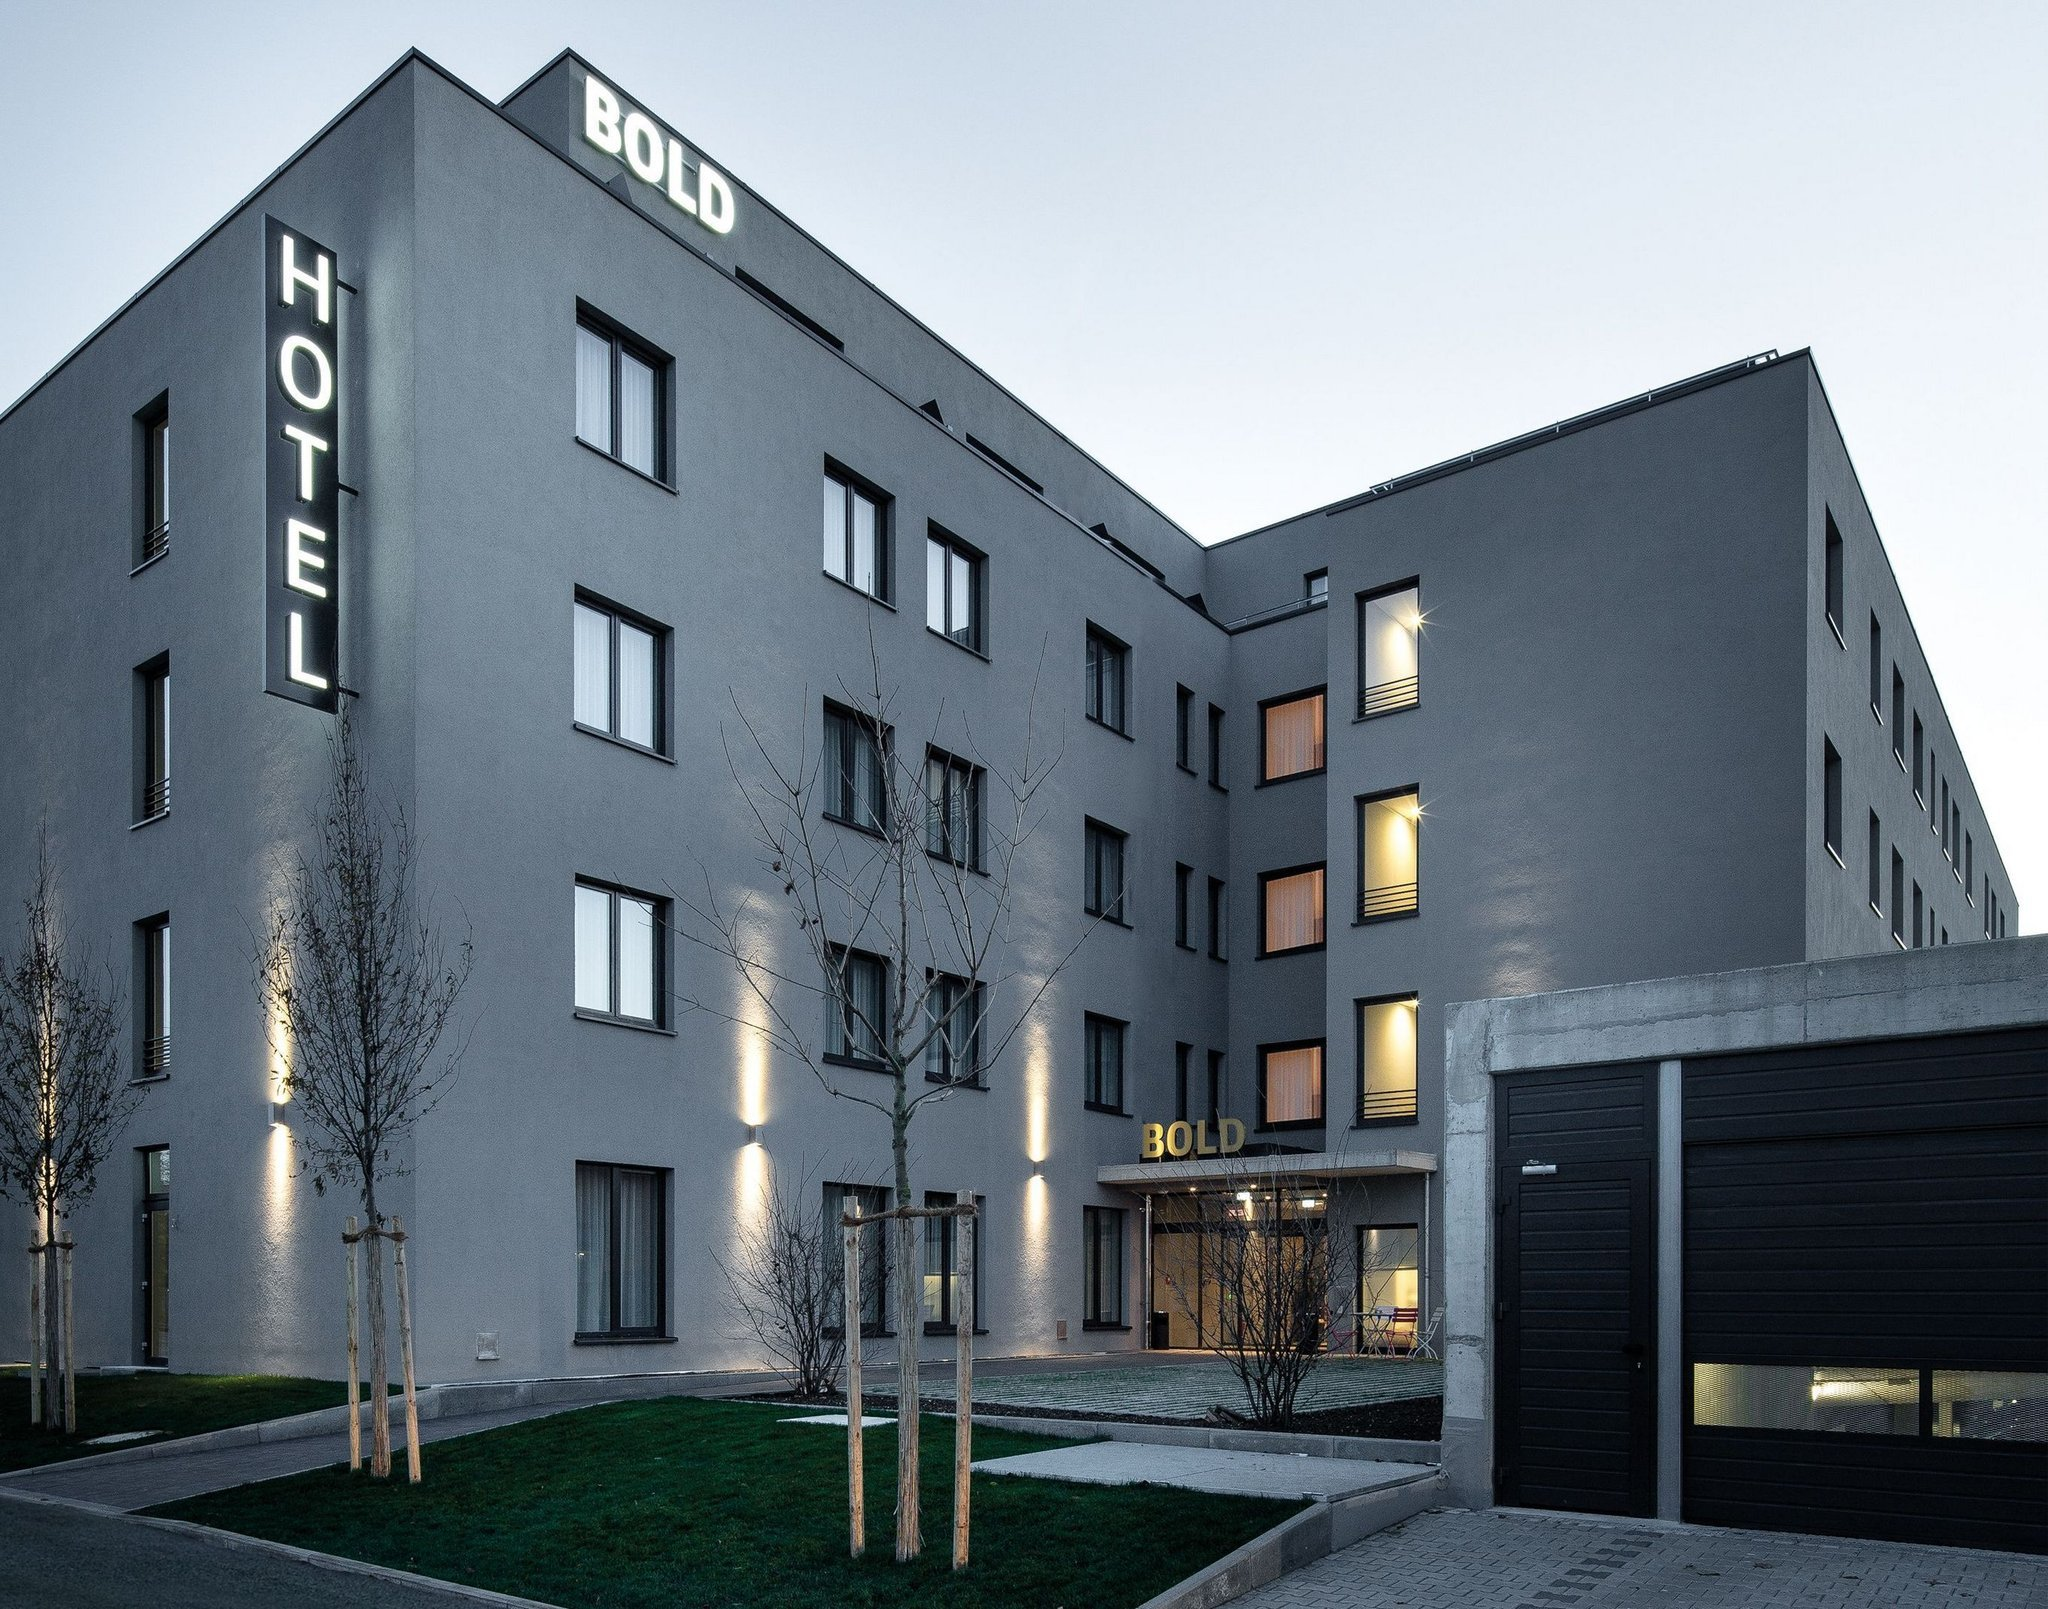 Bold Hotel Muenchen